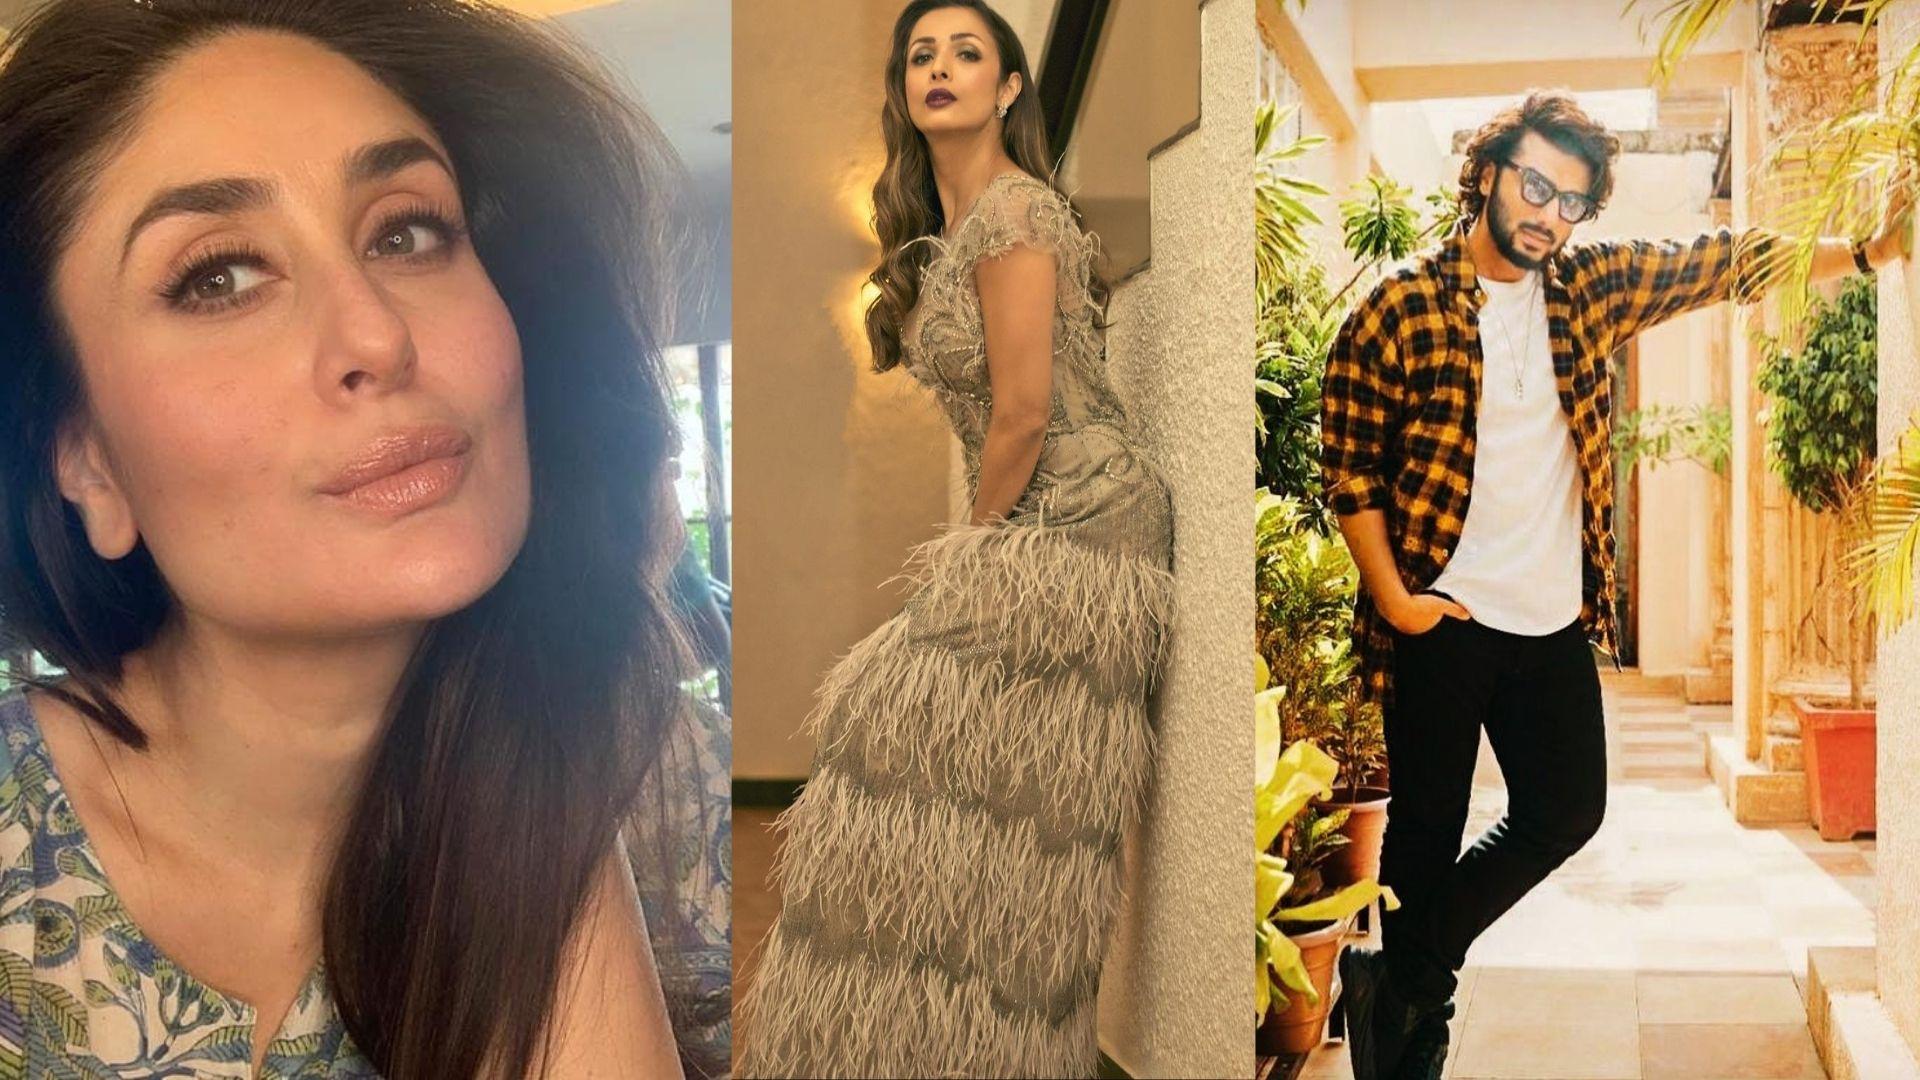 Malaika Arora Birthday: Arjun Kapoor, Kareena Kapoor Khan To Katrina Kaif Among others Wish Malla On Her 49th B'day